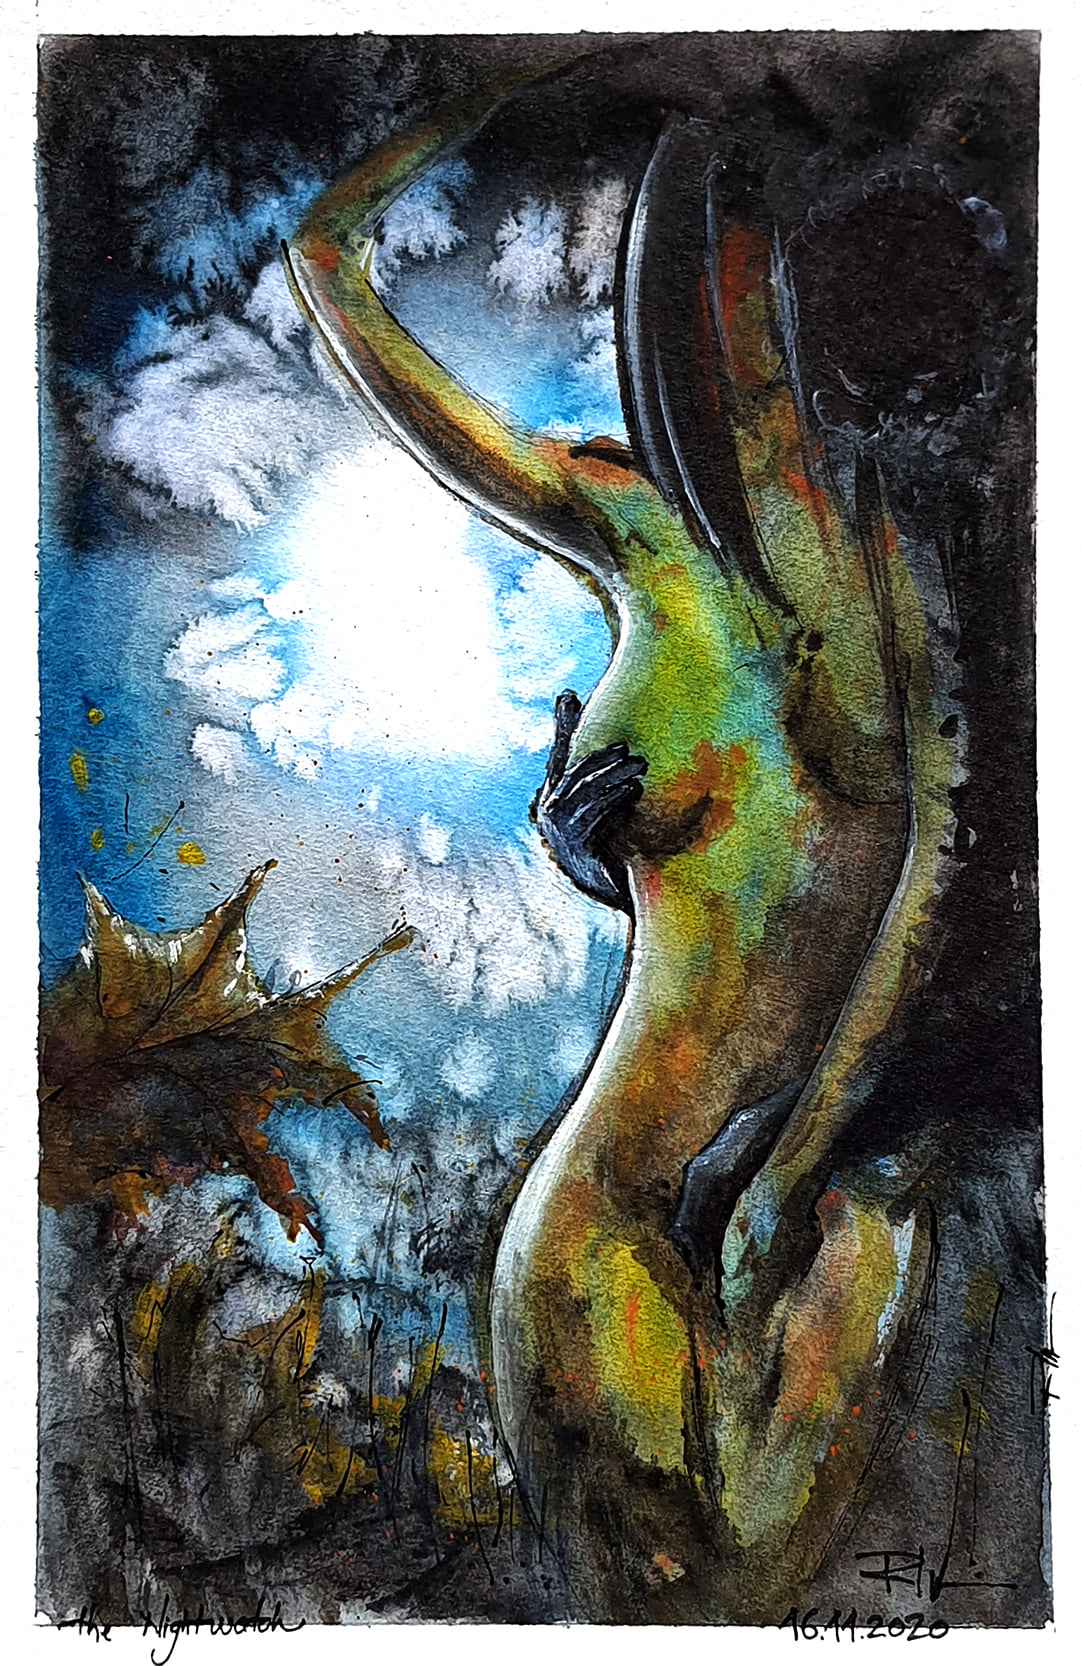 Umbra Nopții, 20x30cm watercolour, 125€